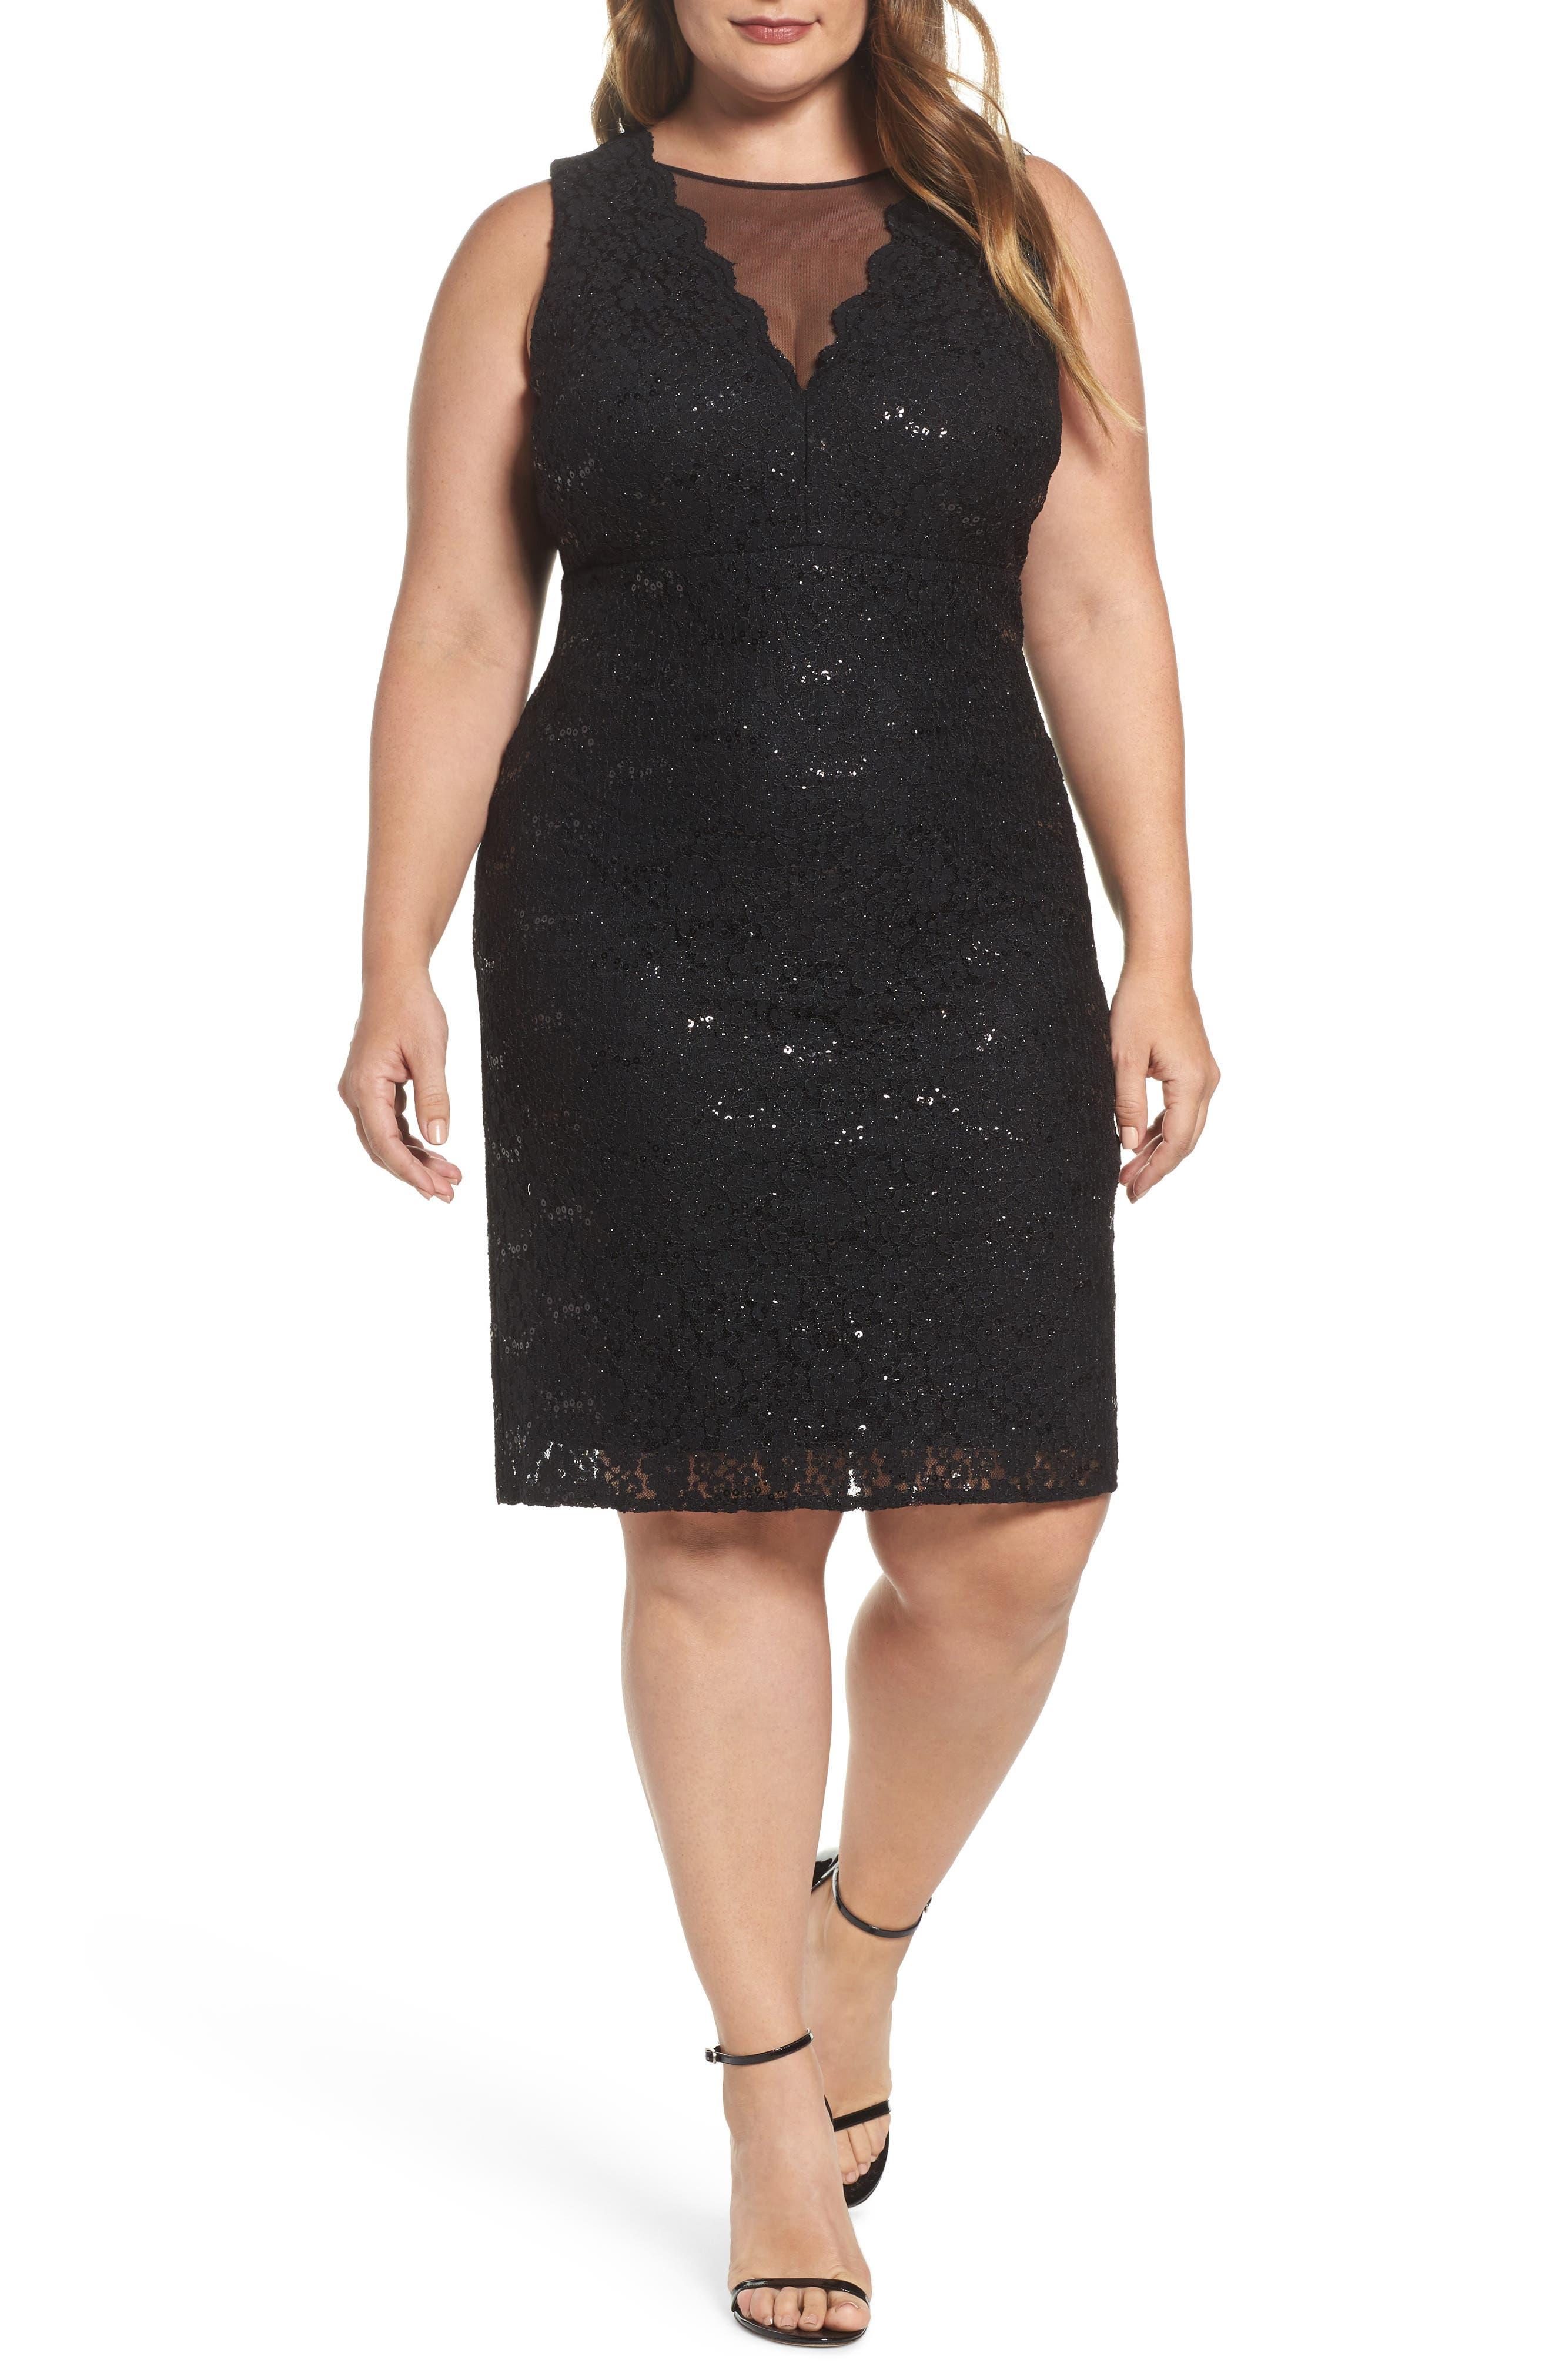 Alternate Image 1 Selected - Morgan & Co. Sequin Lace & Mesh Body-Con Dress (Plus Size)